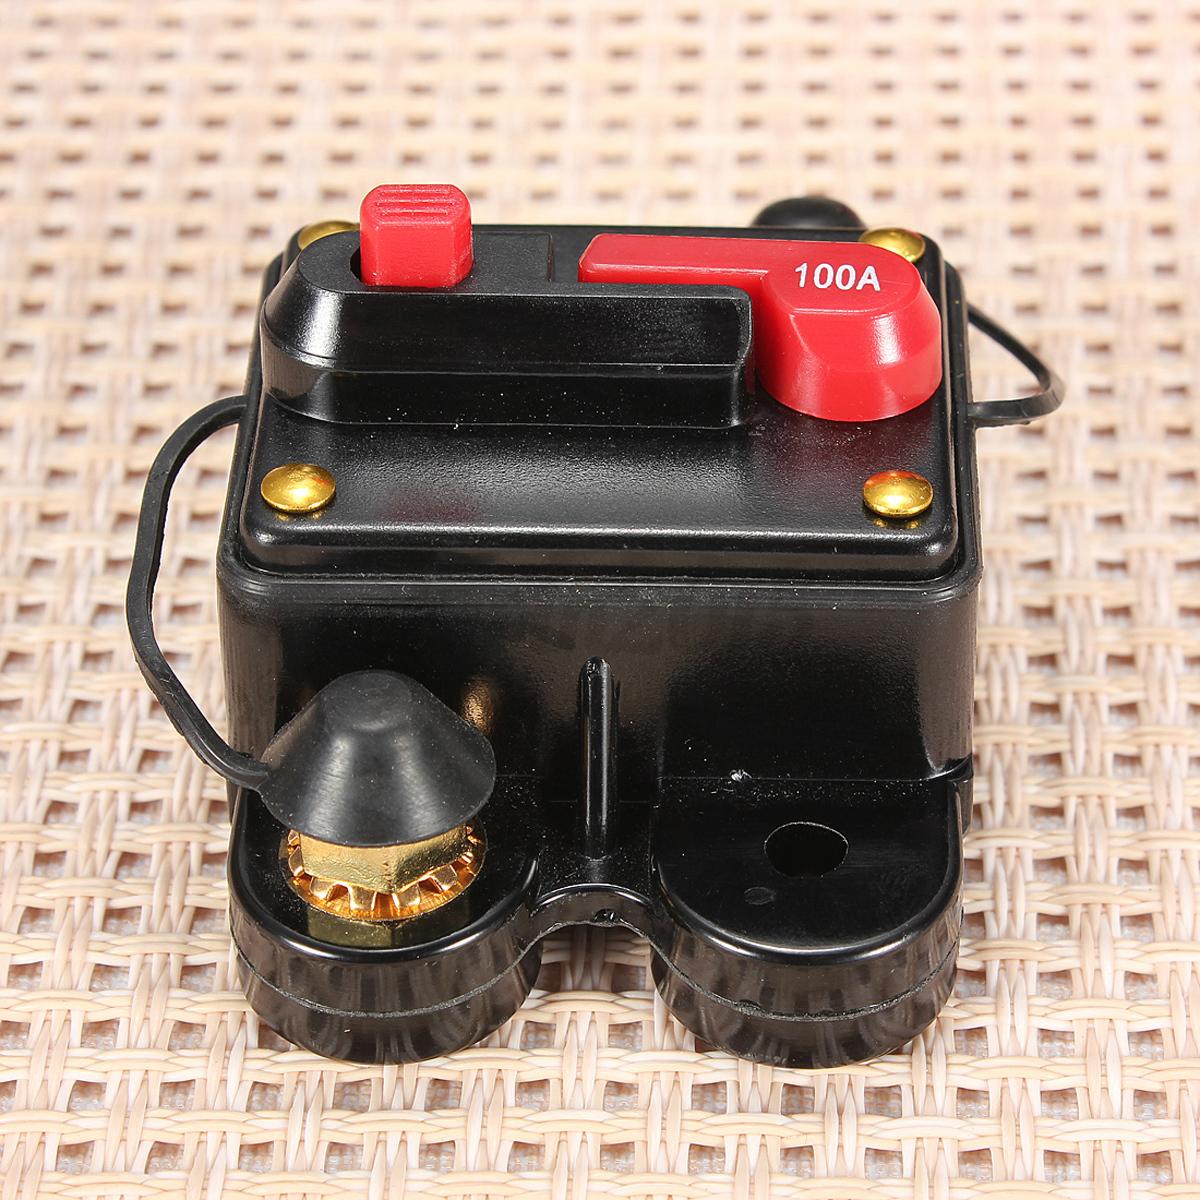 20a breaker fuse box marine circuit breaker fuse box 100-300a amp circuit breaker car marine stereo audio ... #13